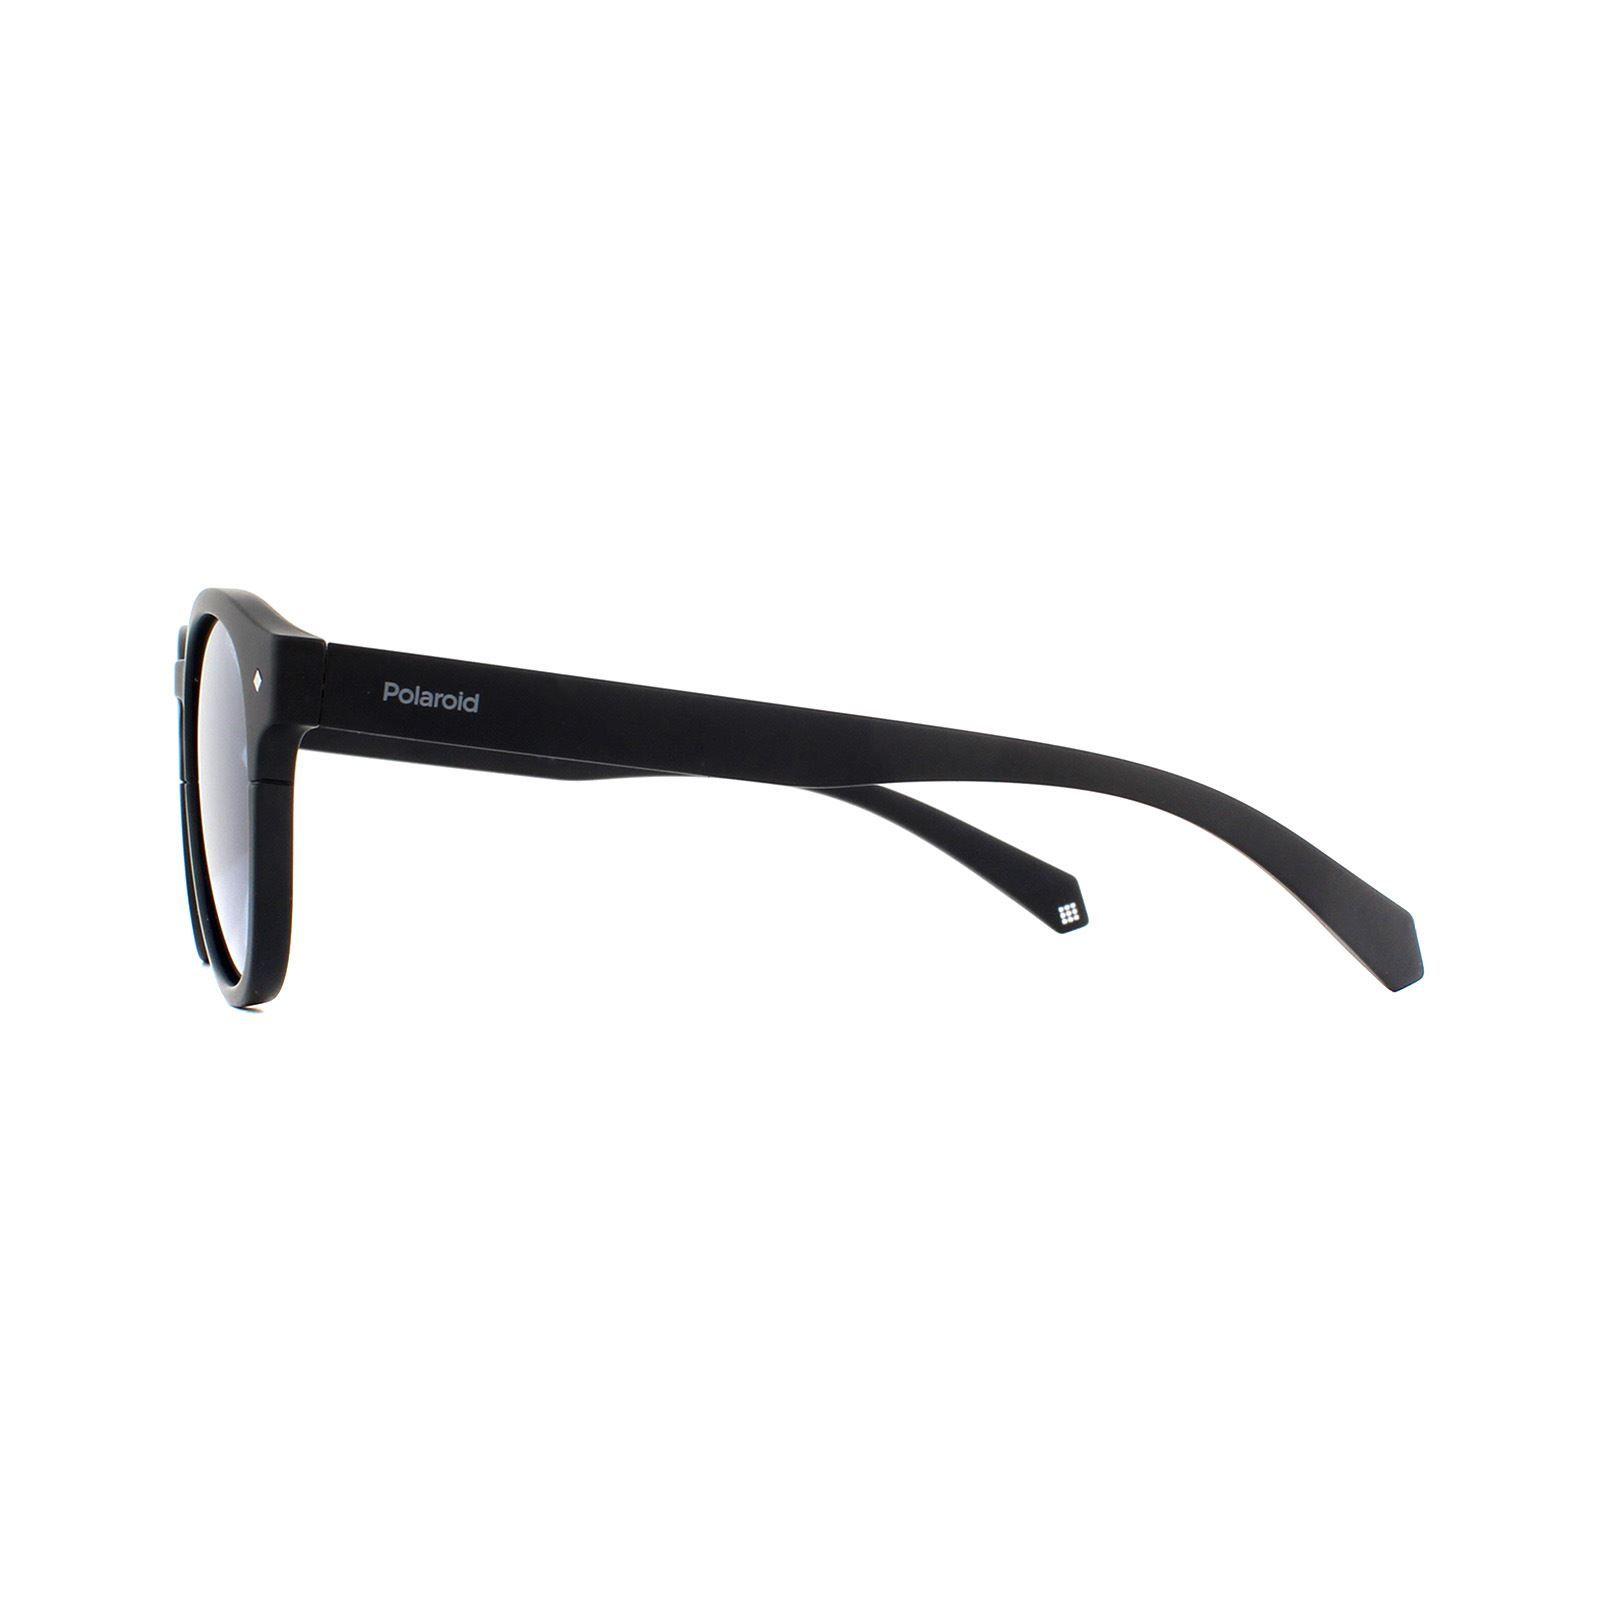 Polaroid Sunglasses 6042/S 003 C3 Matte Black Blue Polarized